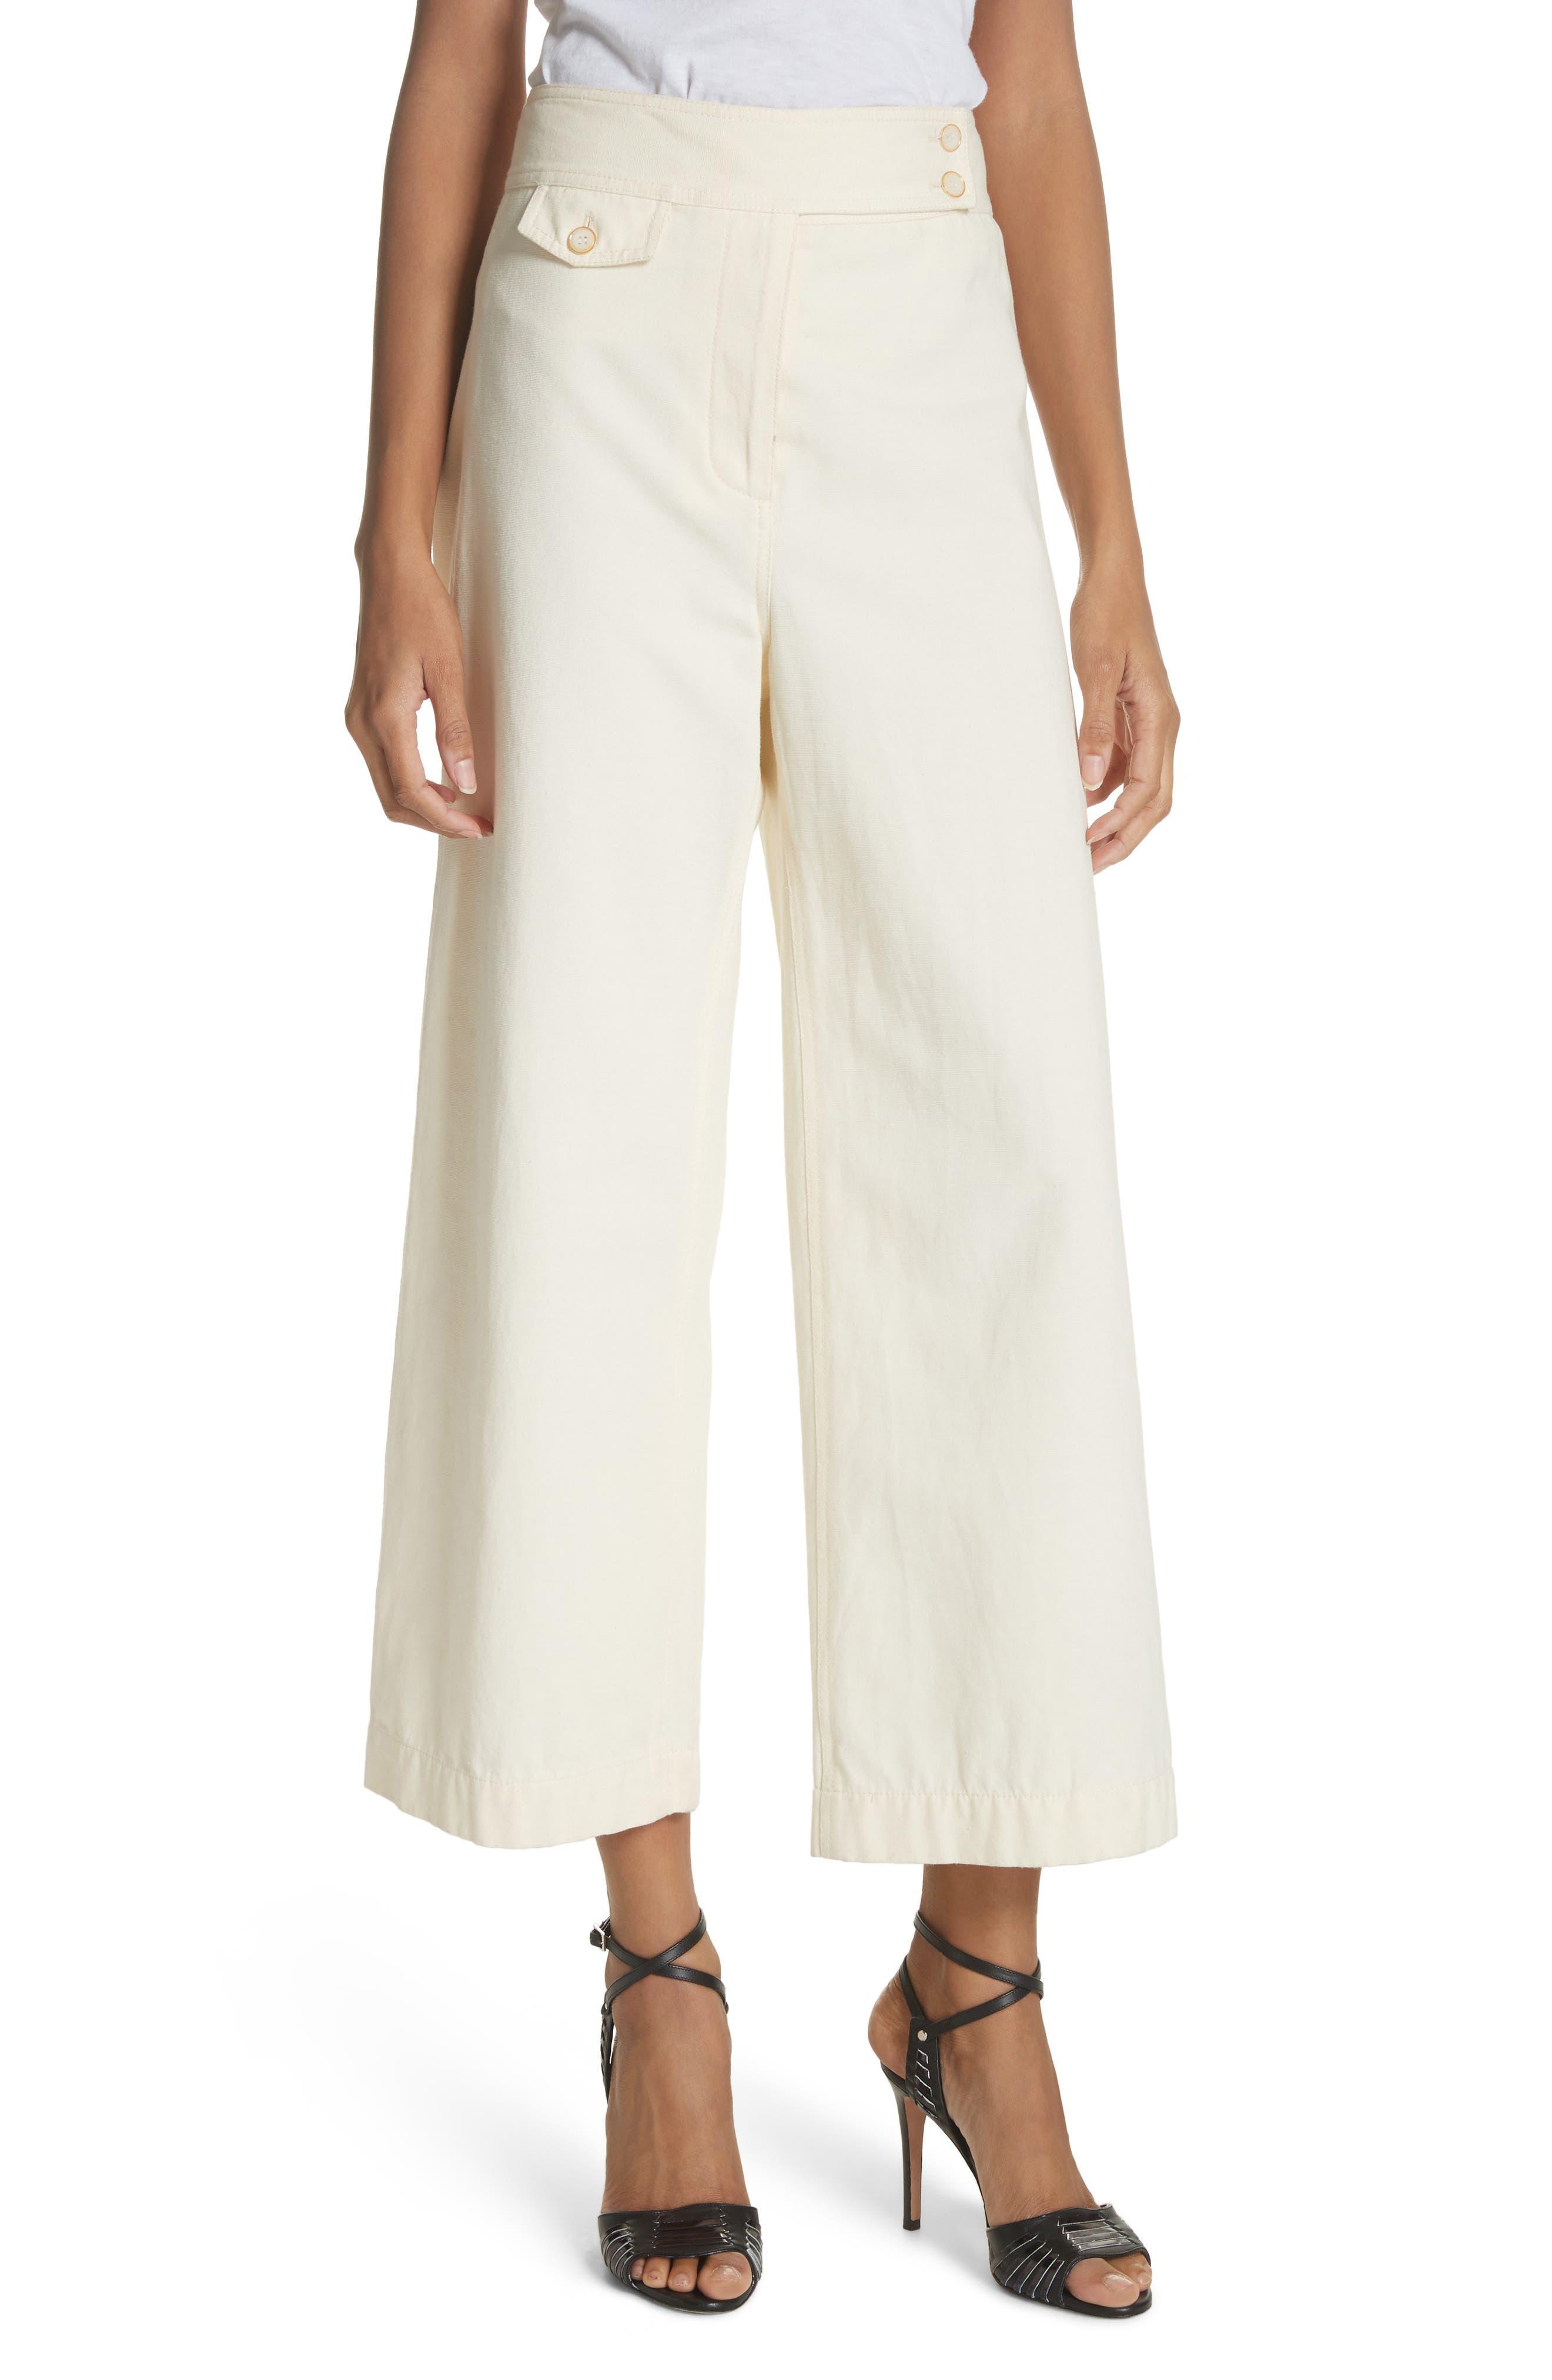 Caymen Cotton Gaucho Pants,                             Main thumbnail 1, color,                             Natural